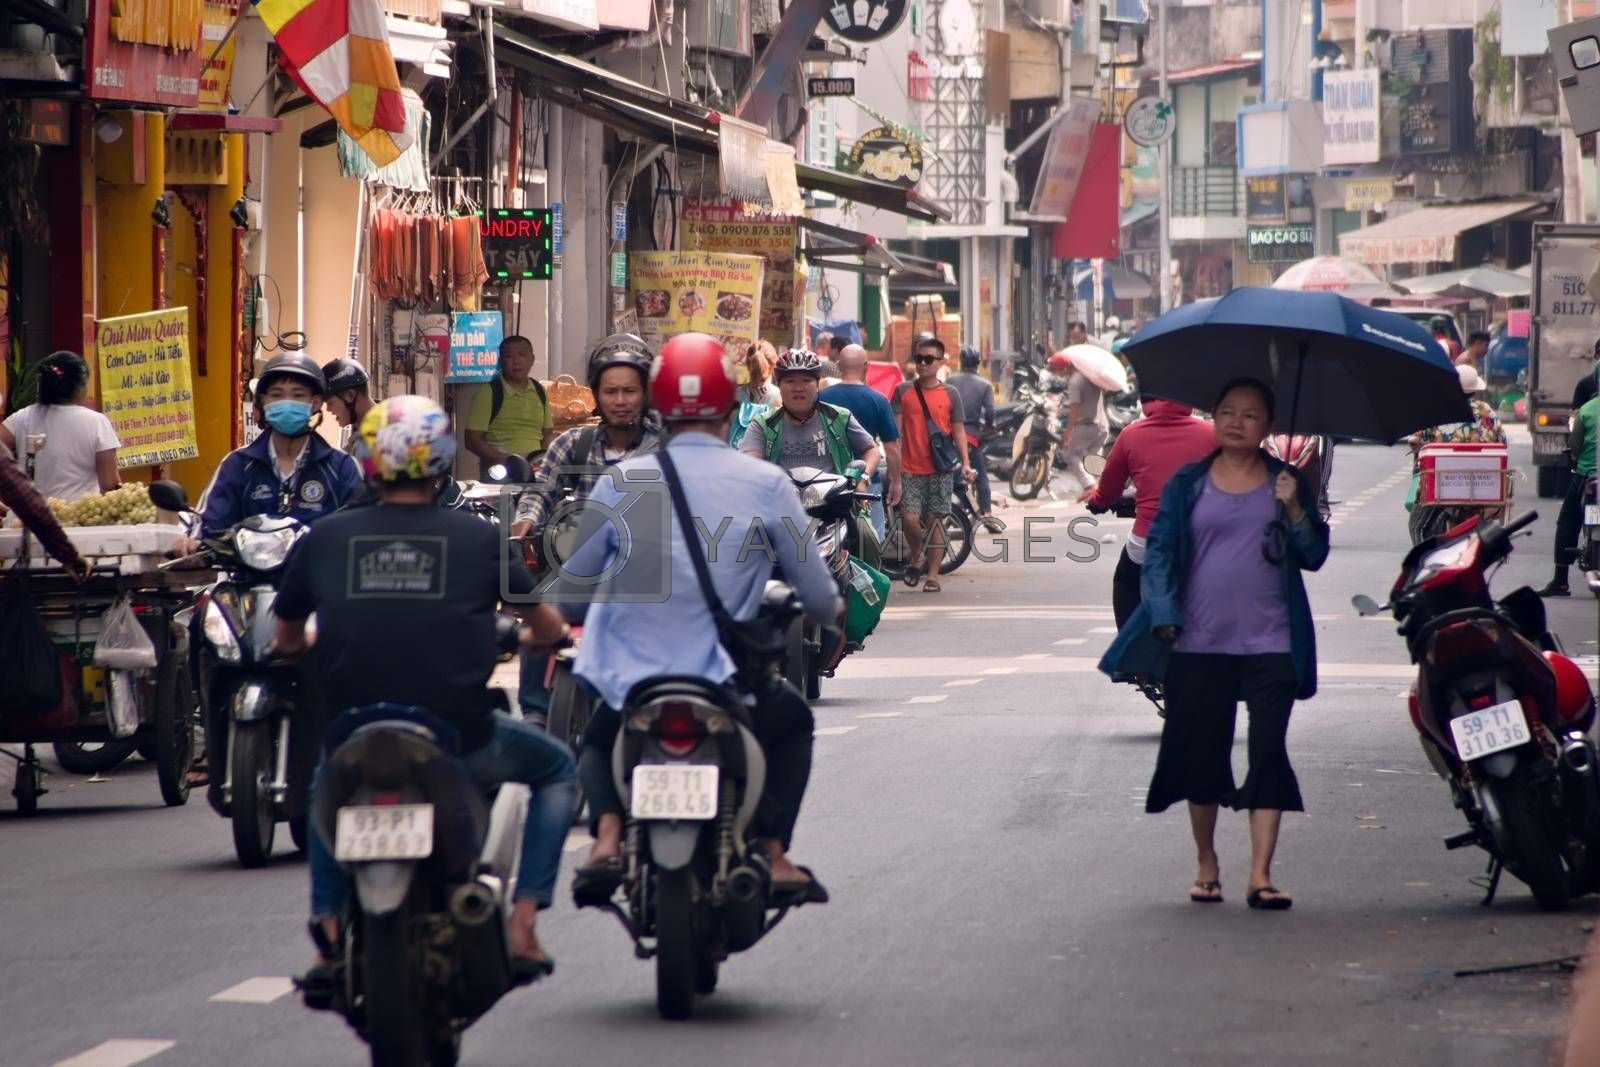 Royalty free image of 2019-11-12 / Ho Chi Minh City, Vietnam - Urban scene in a city street. by hernan_hyper